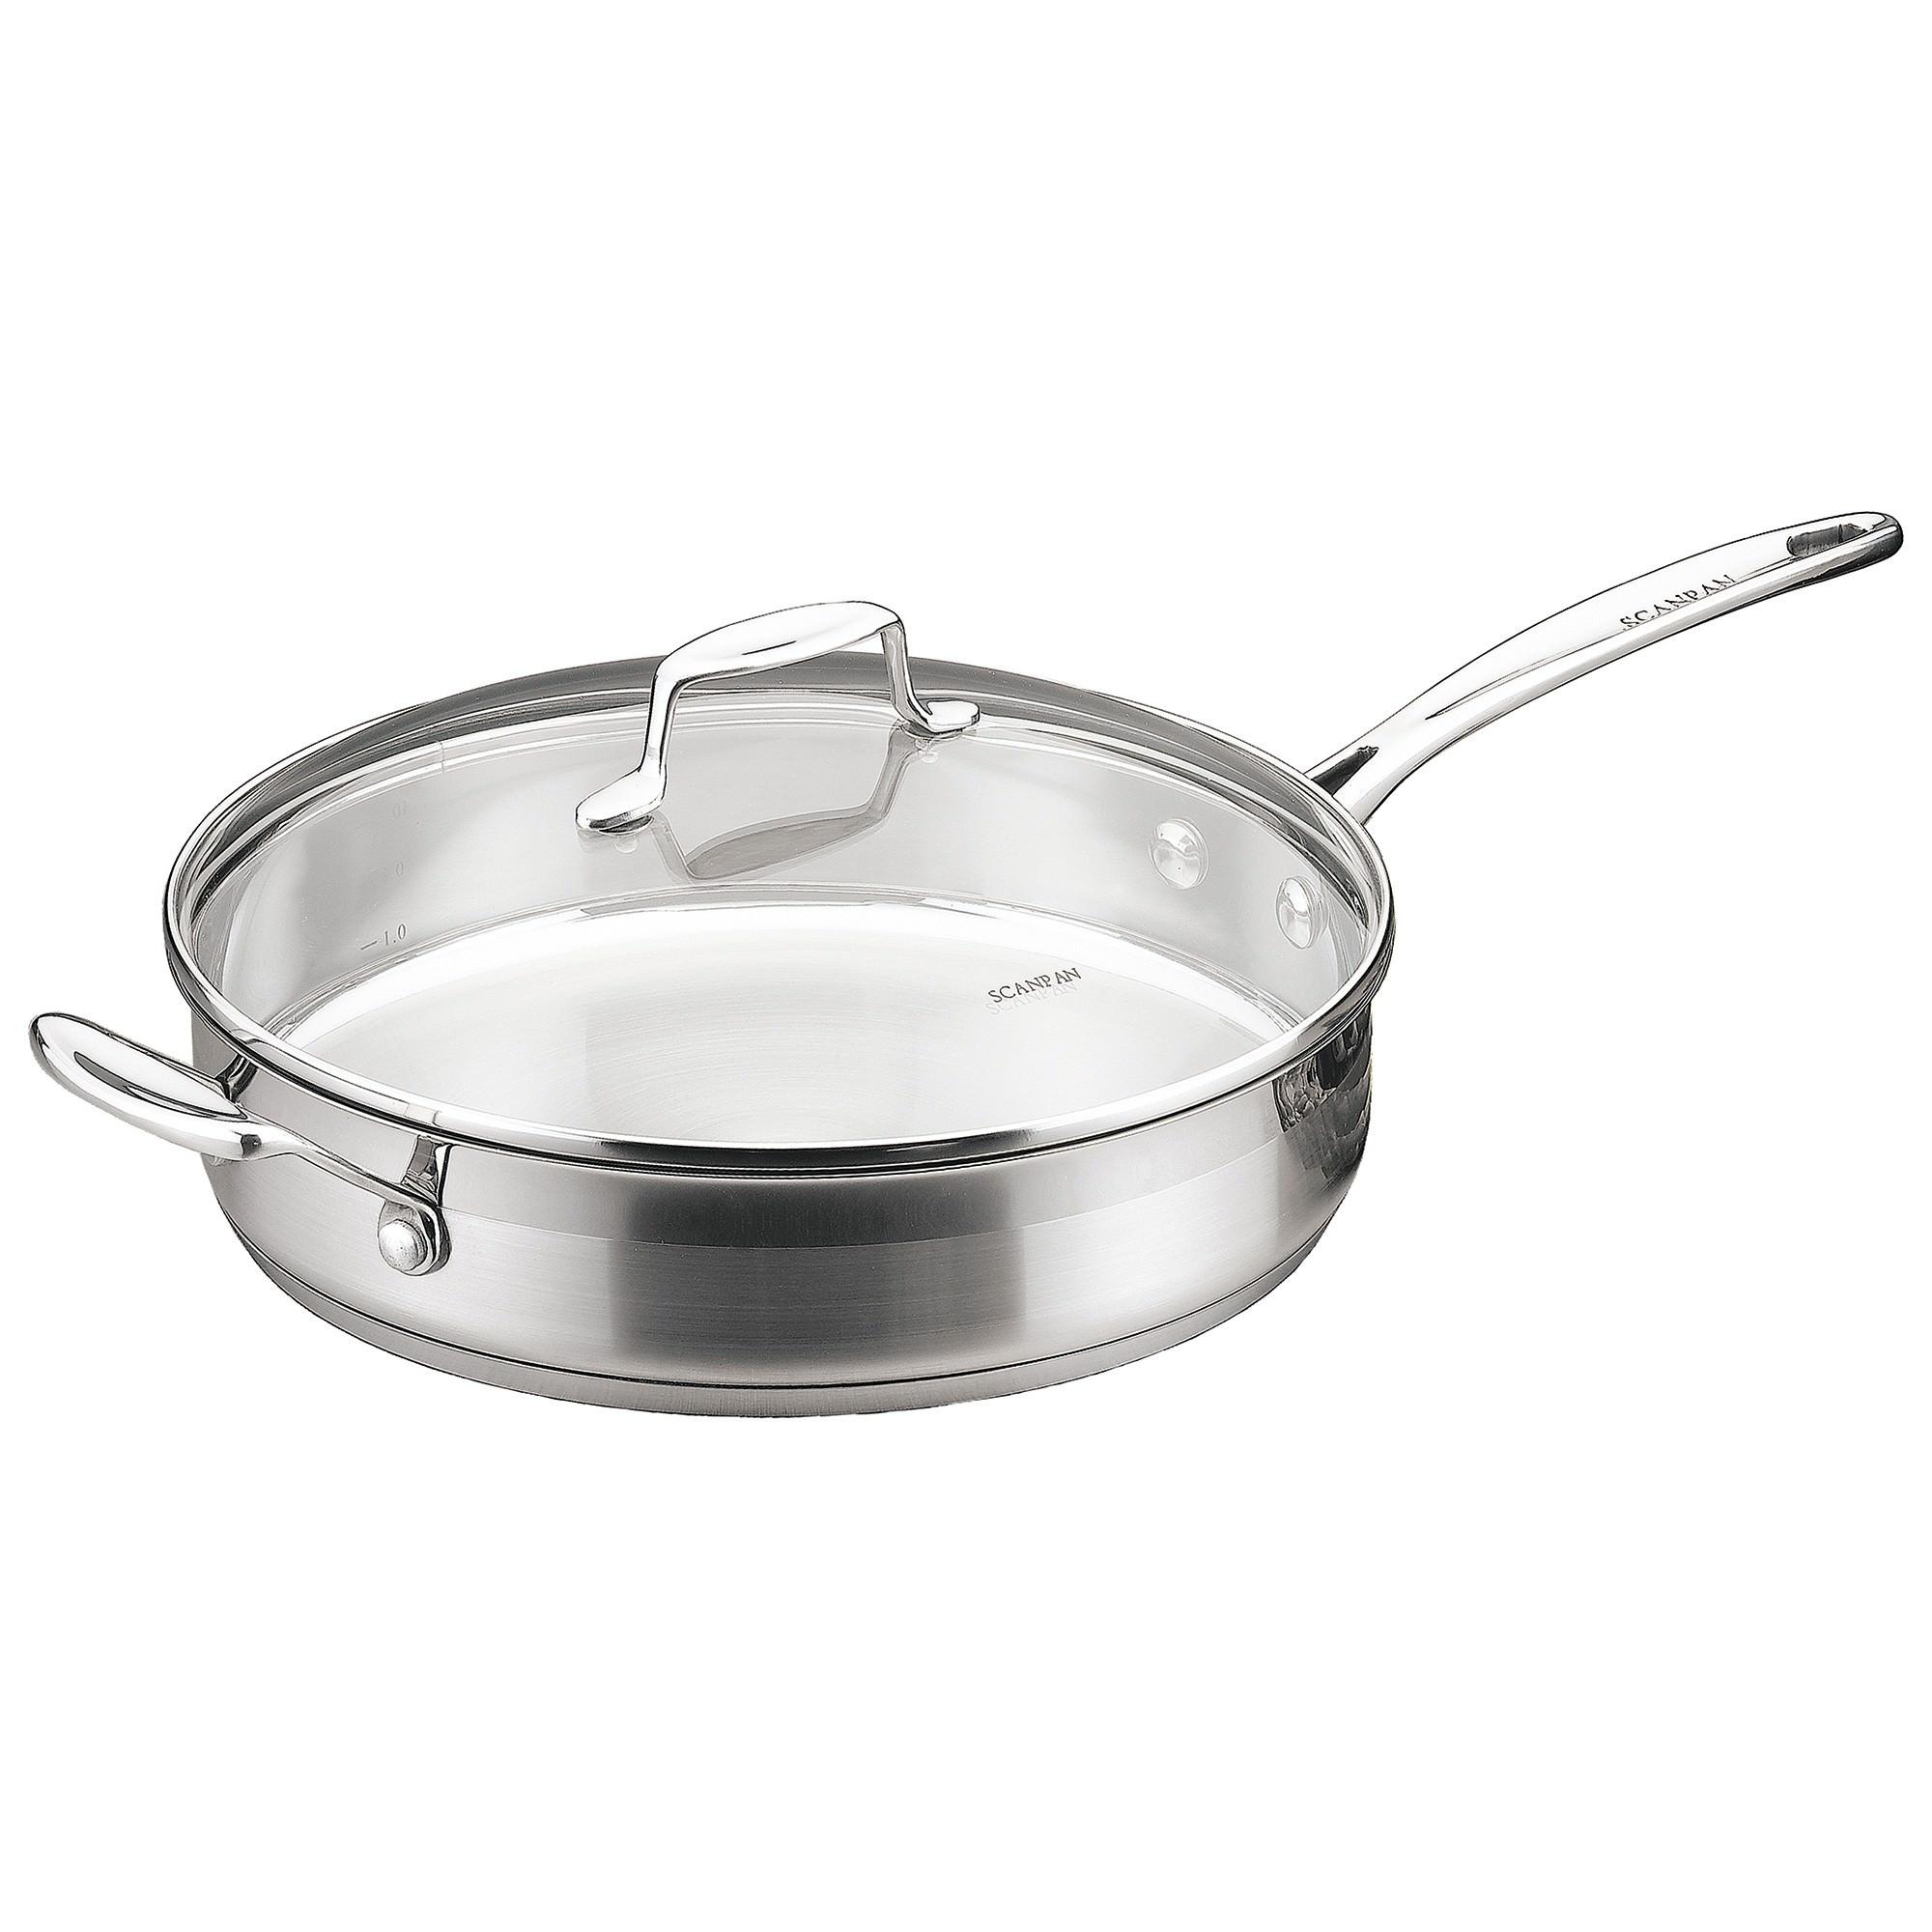 Scanpan Impact 28cm Saute Pan with Lid